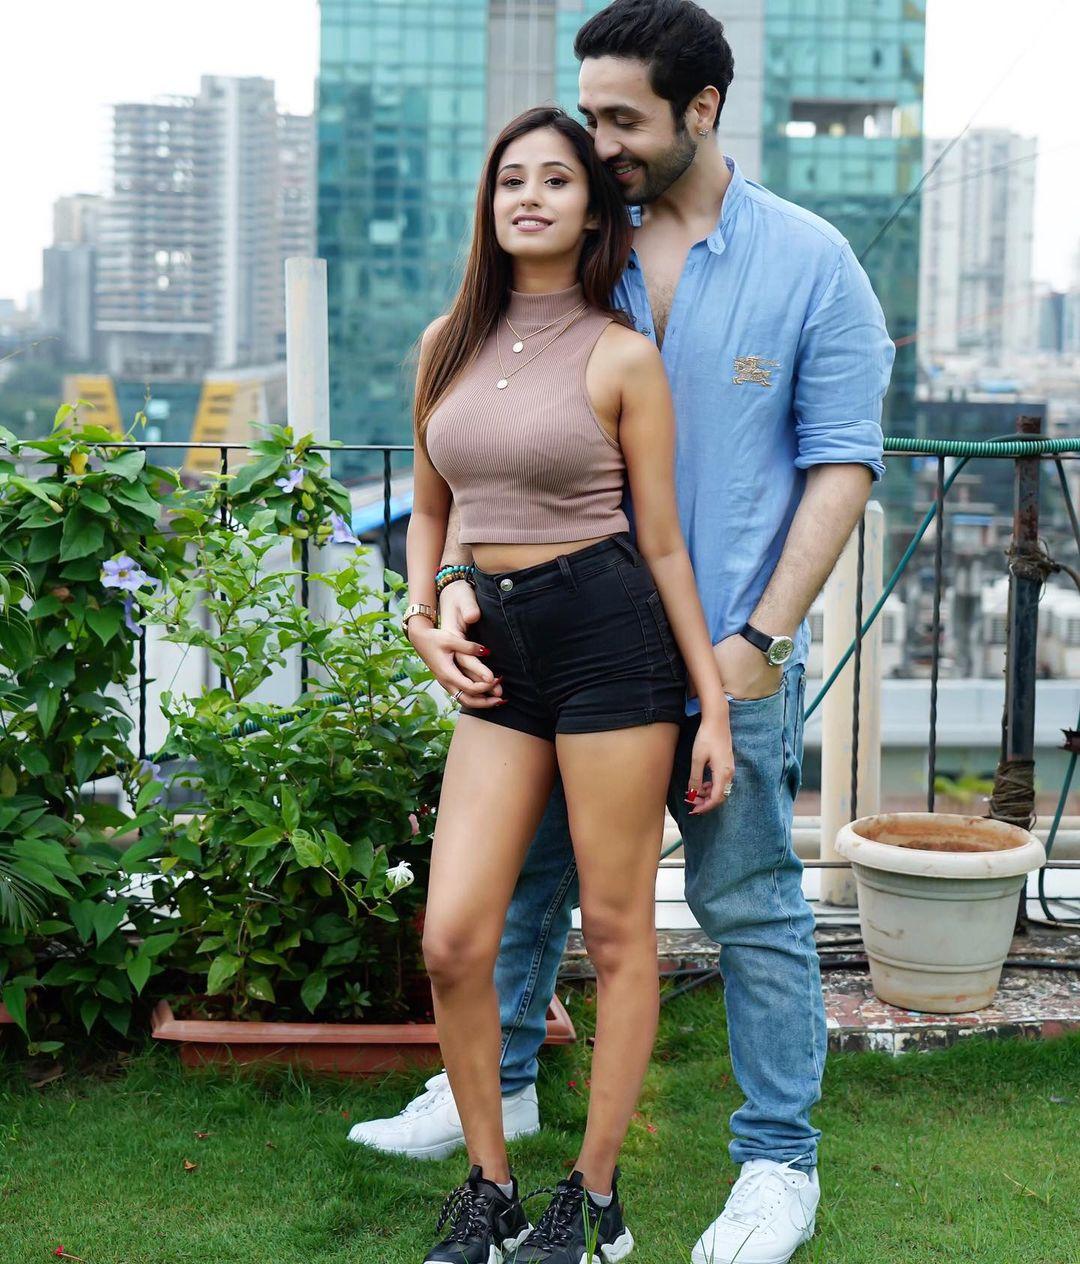 Maera Mishra and Adhyayan Suman photos